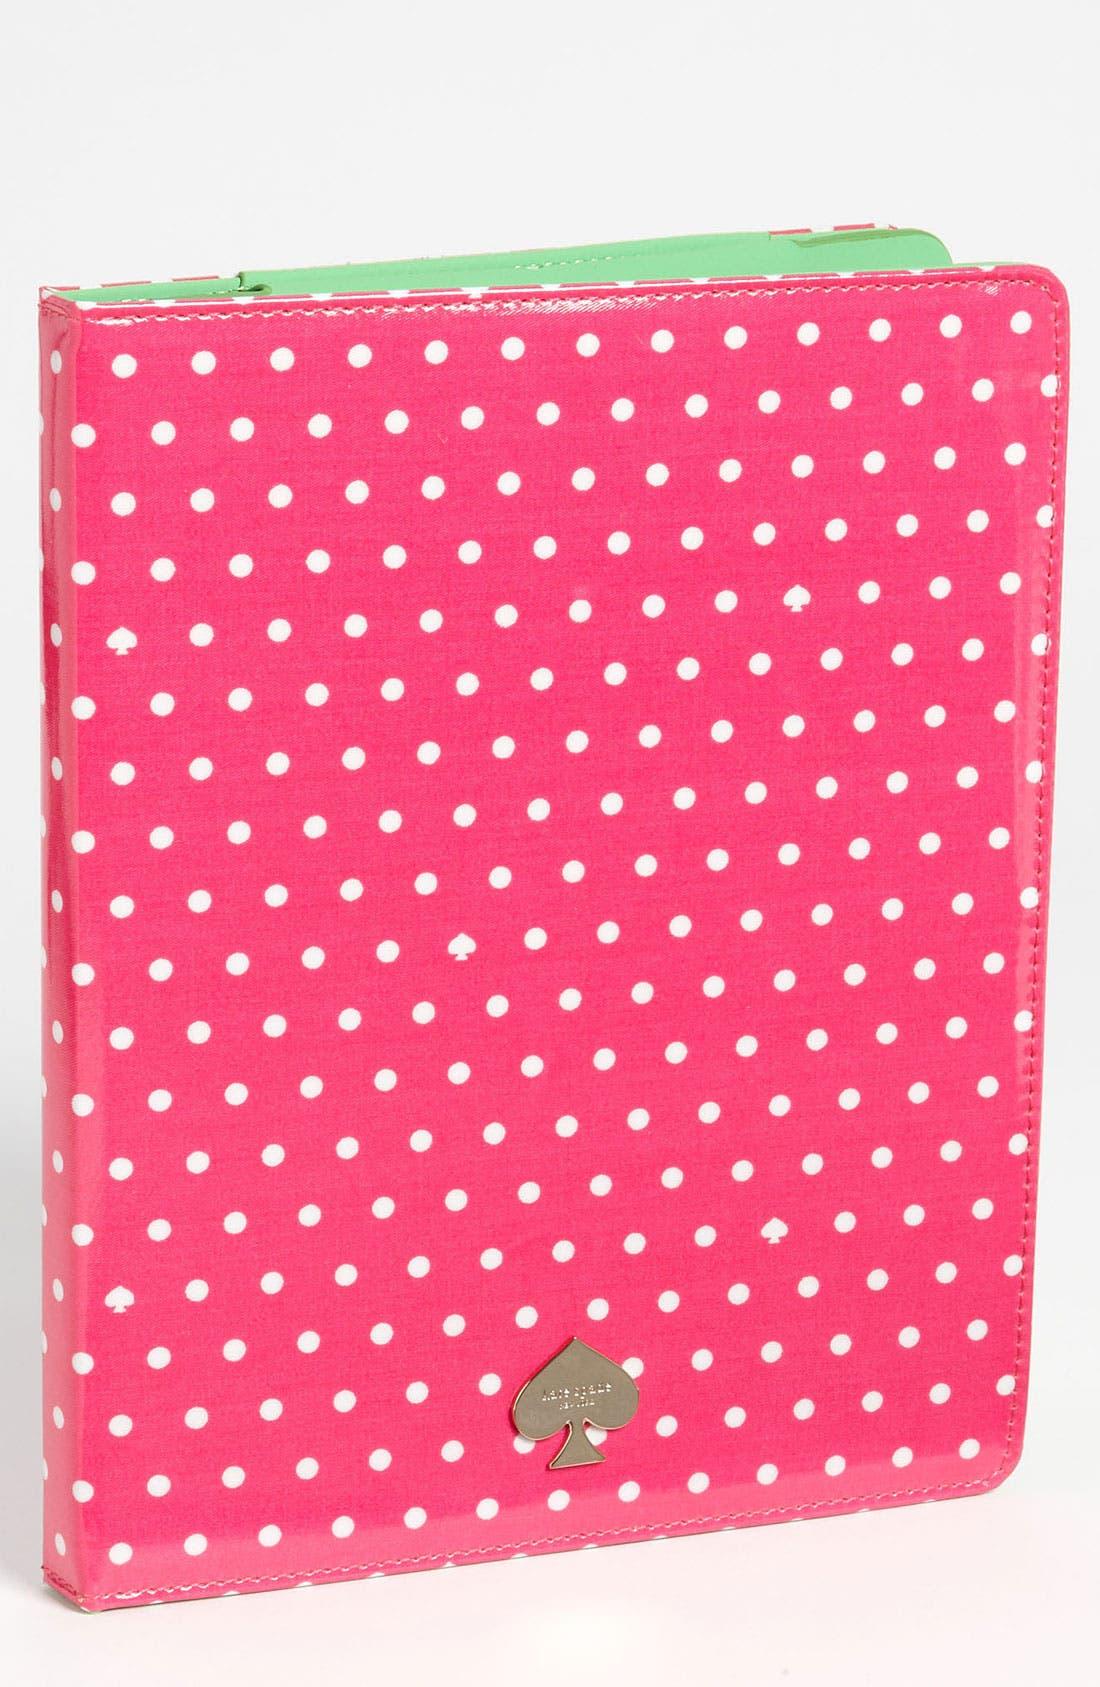 Alternate Image 1 Selected - kate spade new york 'dots and spades' iPad folio